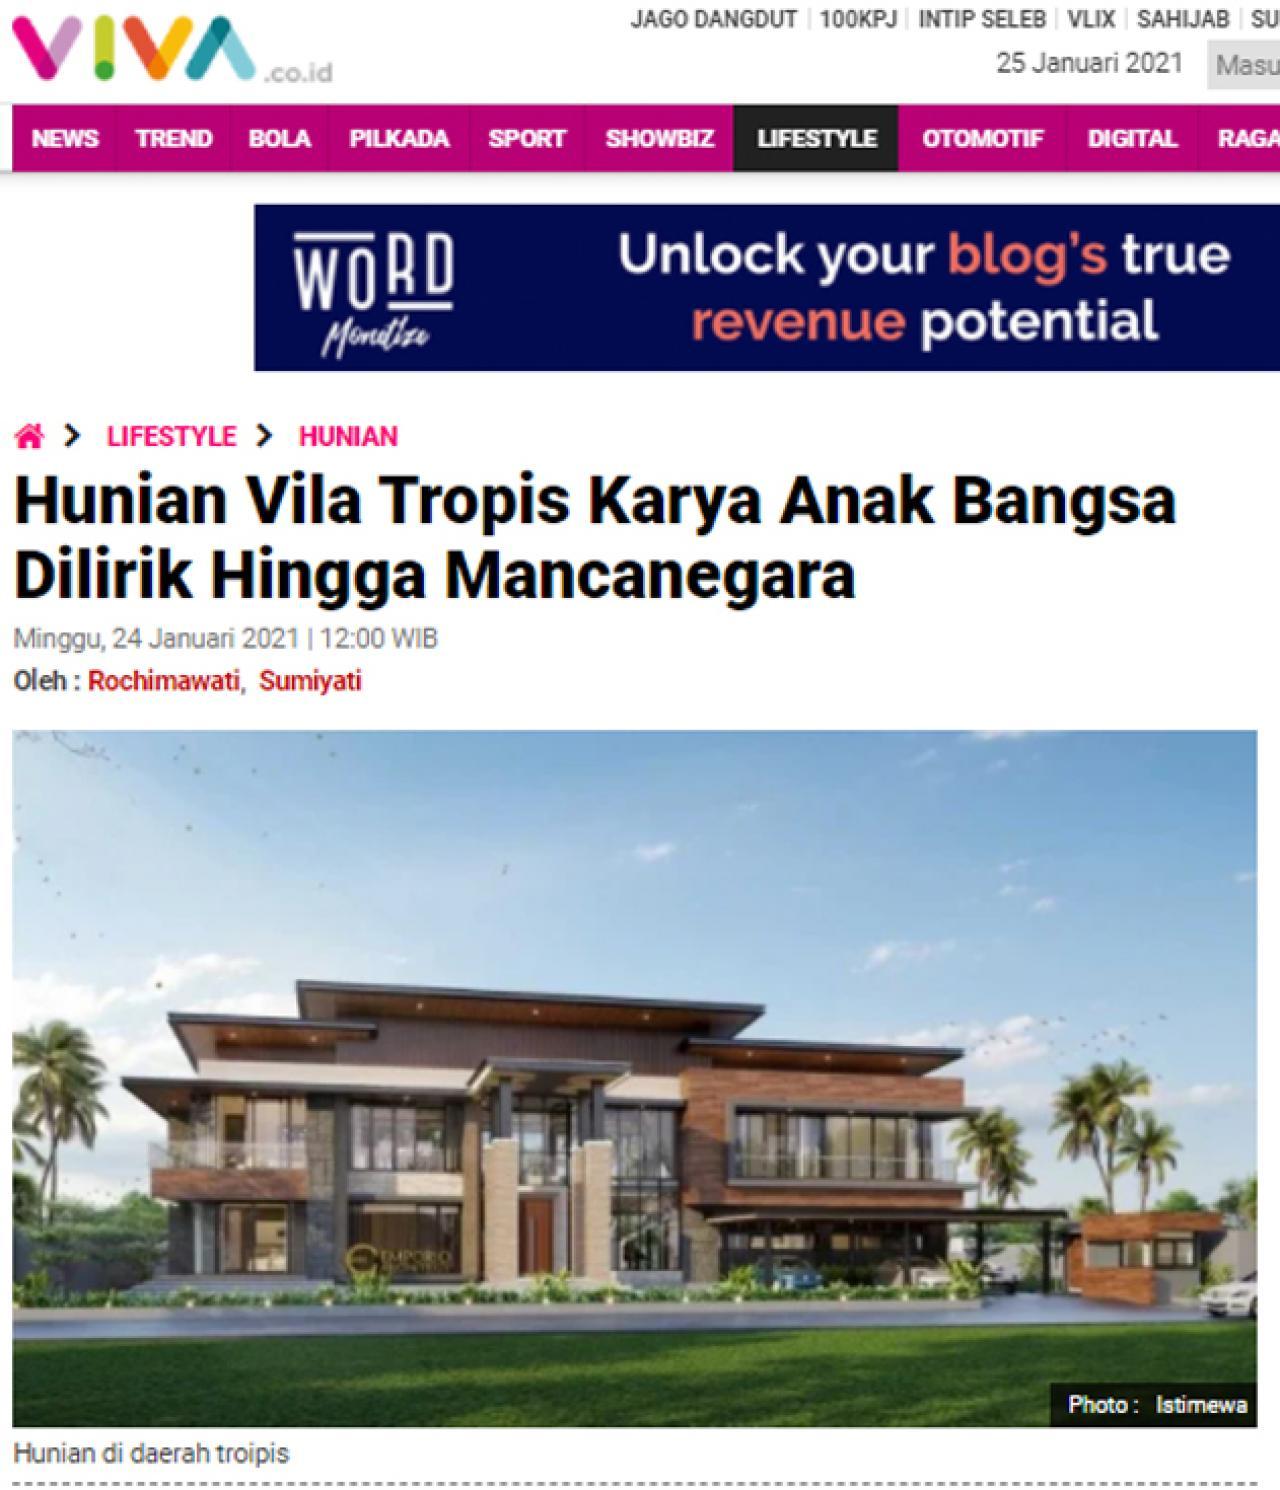 Ulasan Media VIVA.co.id - Hunian Vila Tropis Karya Anak Bangsa Dilirik Hingga Mancanegara